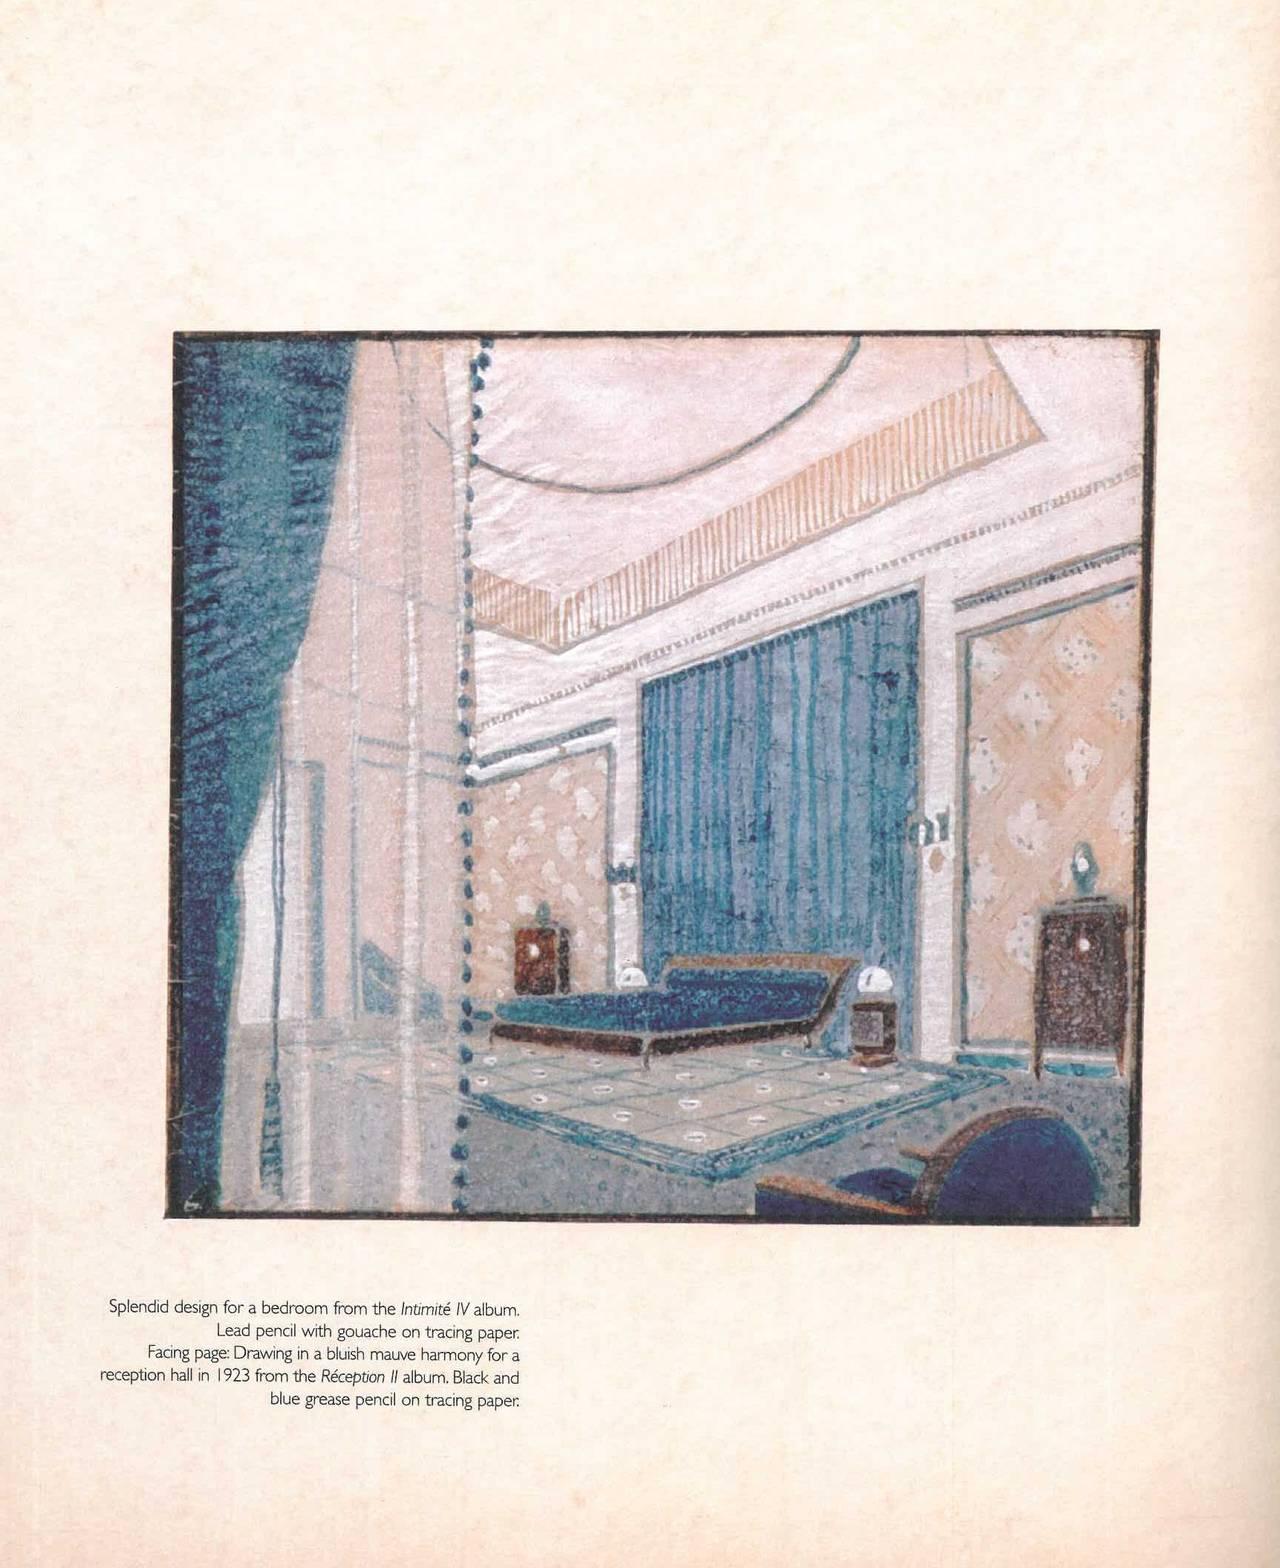 Furniture And Interior Design Books ~ Jacques emile ruhlmann furniture and interior design